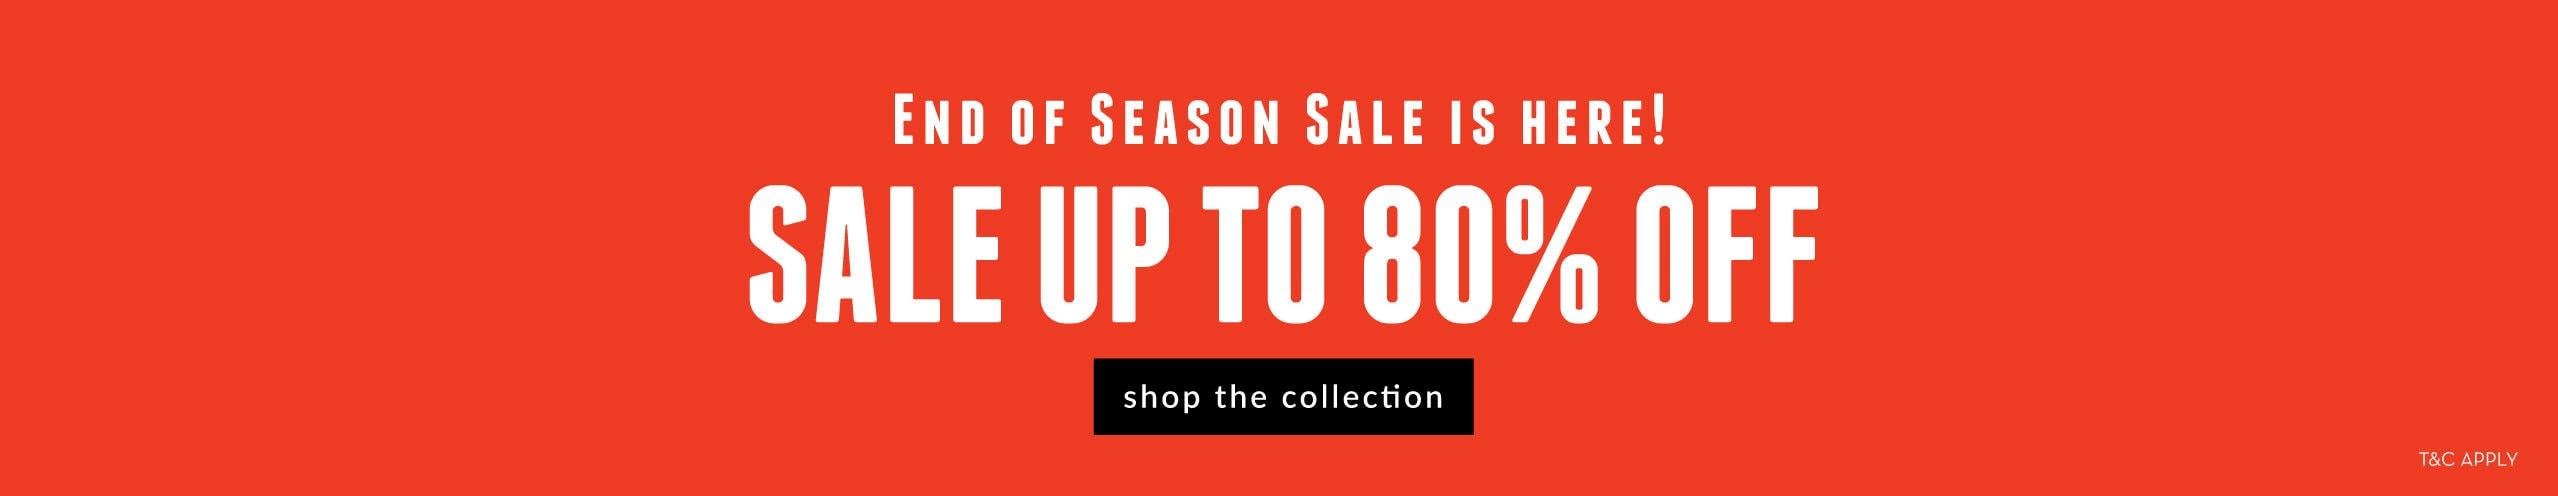 https://www.perniaspopupshop.com/listing/festive-offers